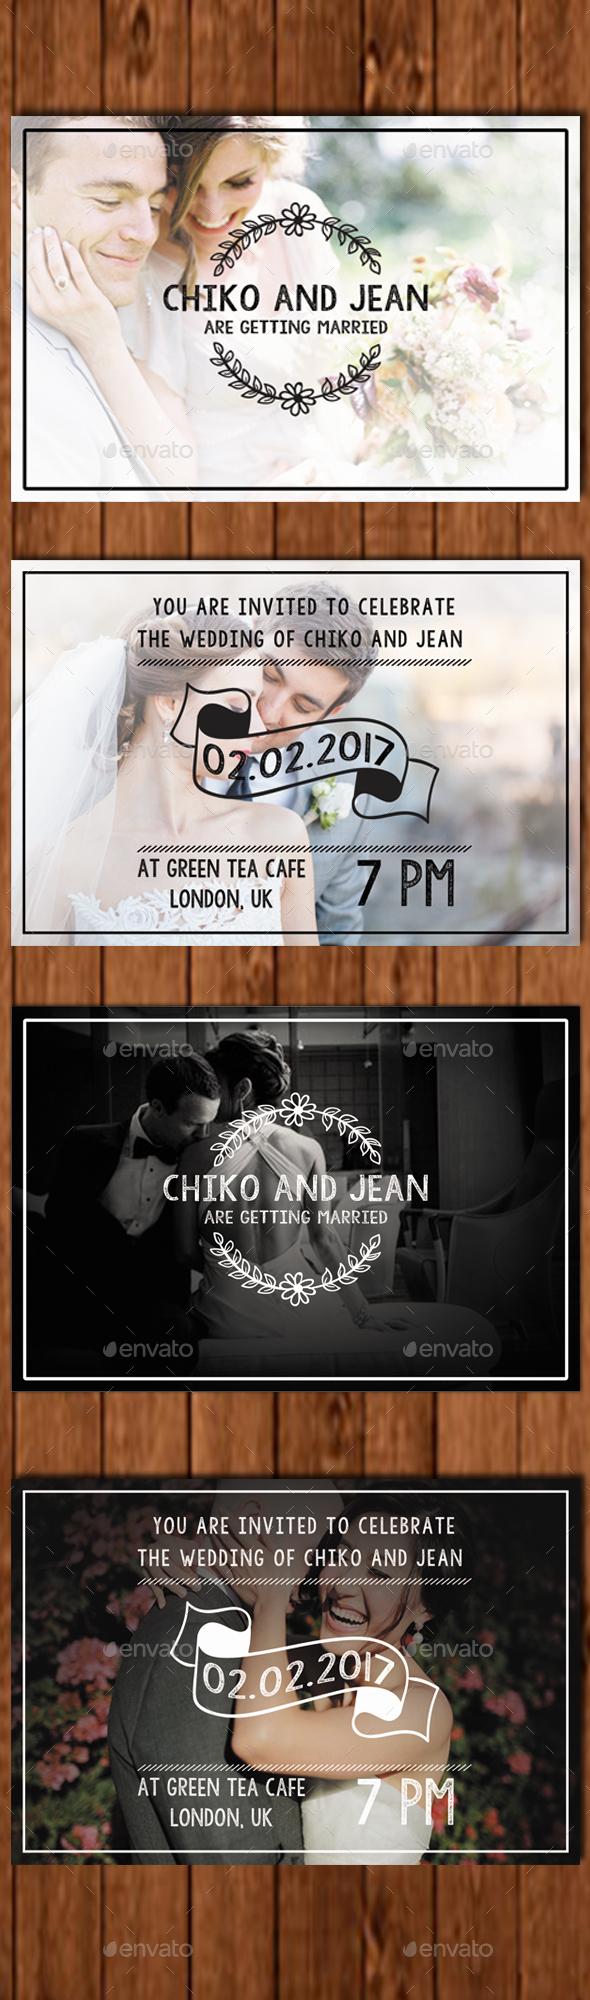 Wedding Invitation Card 2 - Weddings Cards & Invites